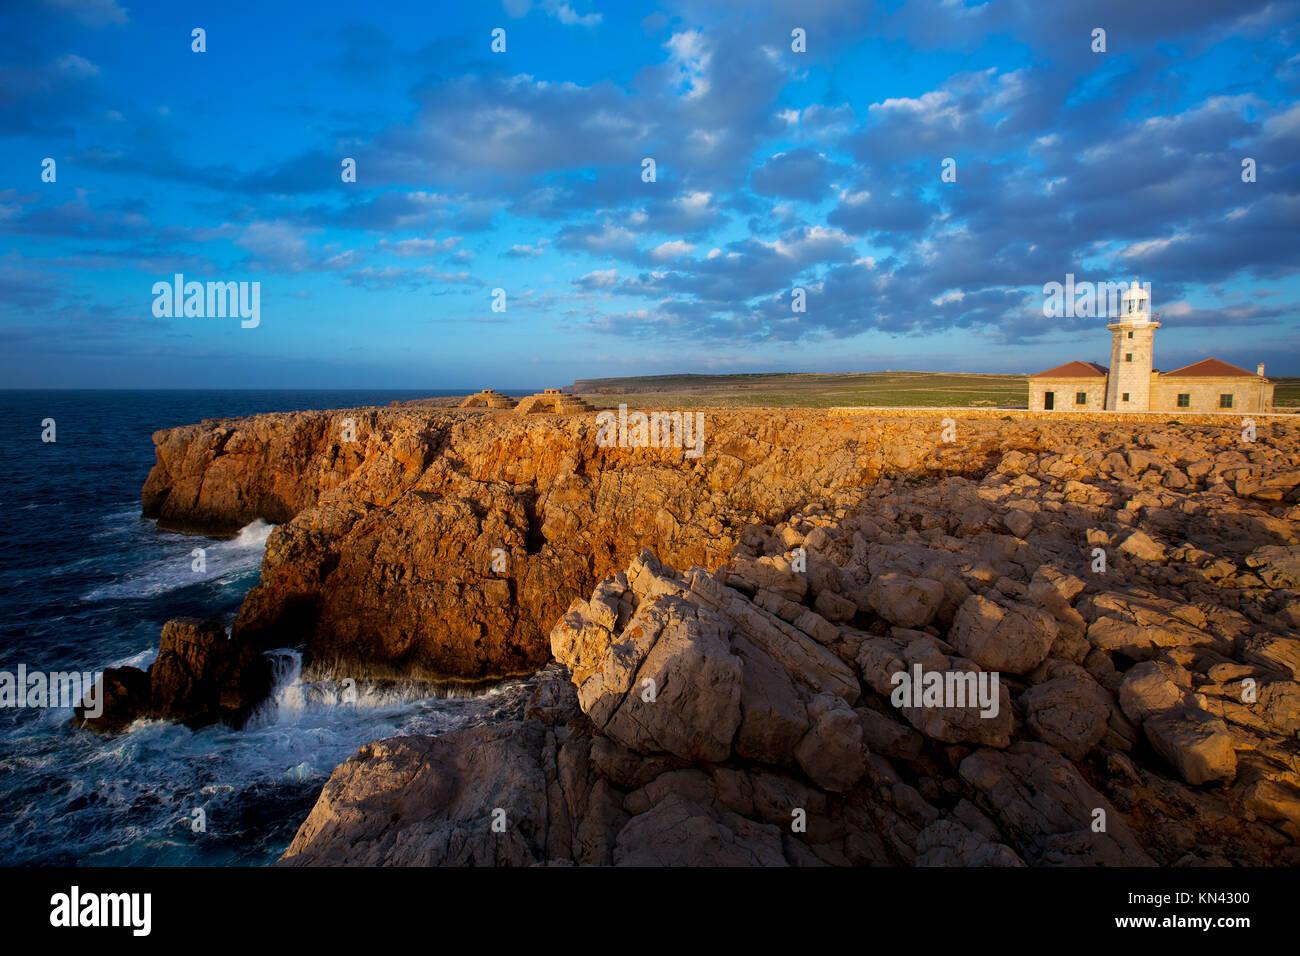 Menorca Punta Nati Faro lighthouse in Ciutadella Balearic Islands of Spain. - Stock Image